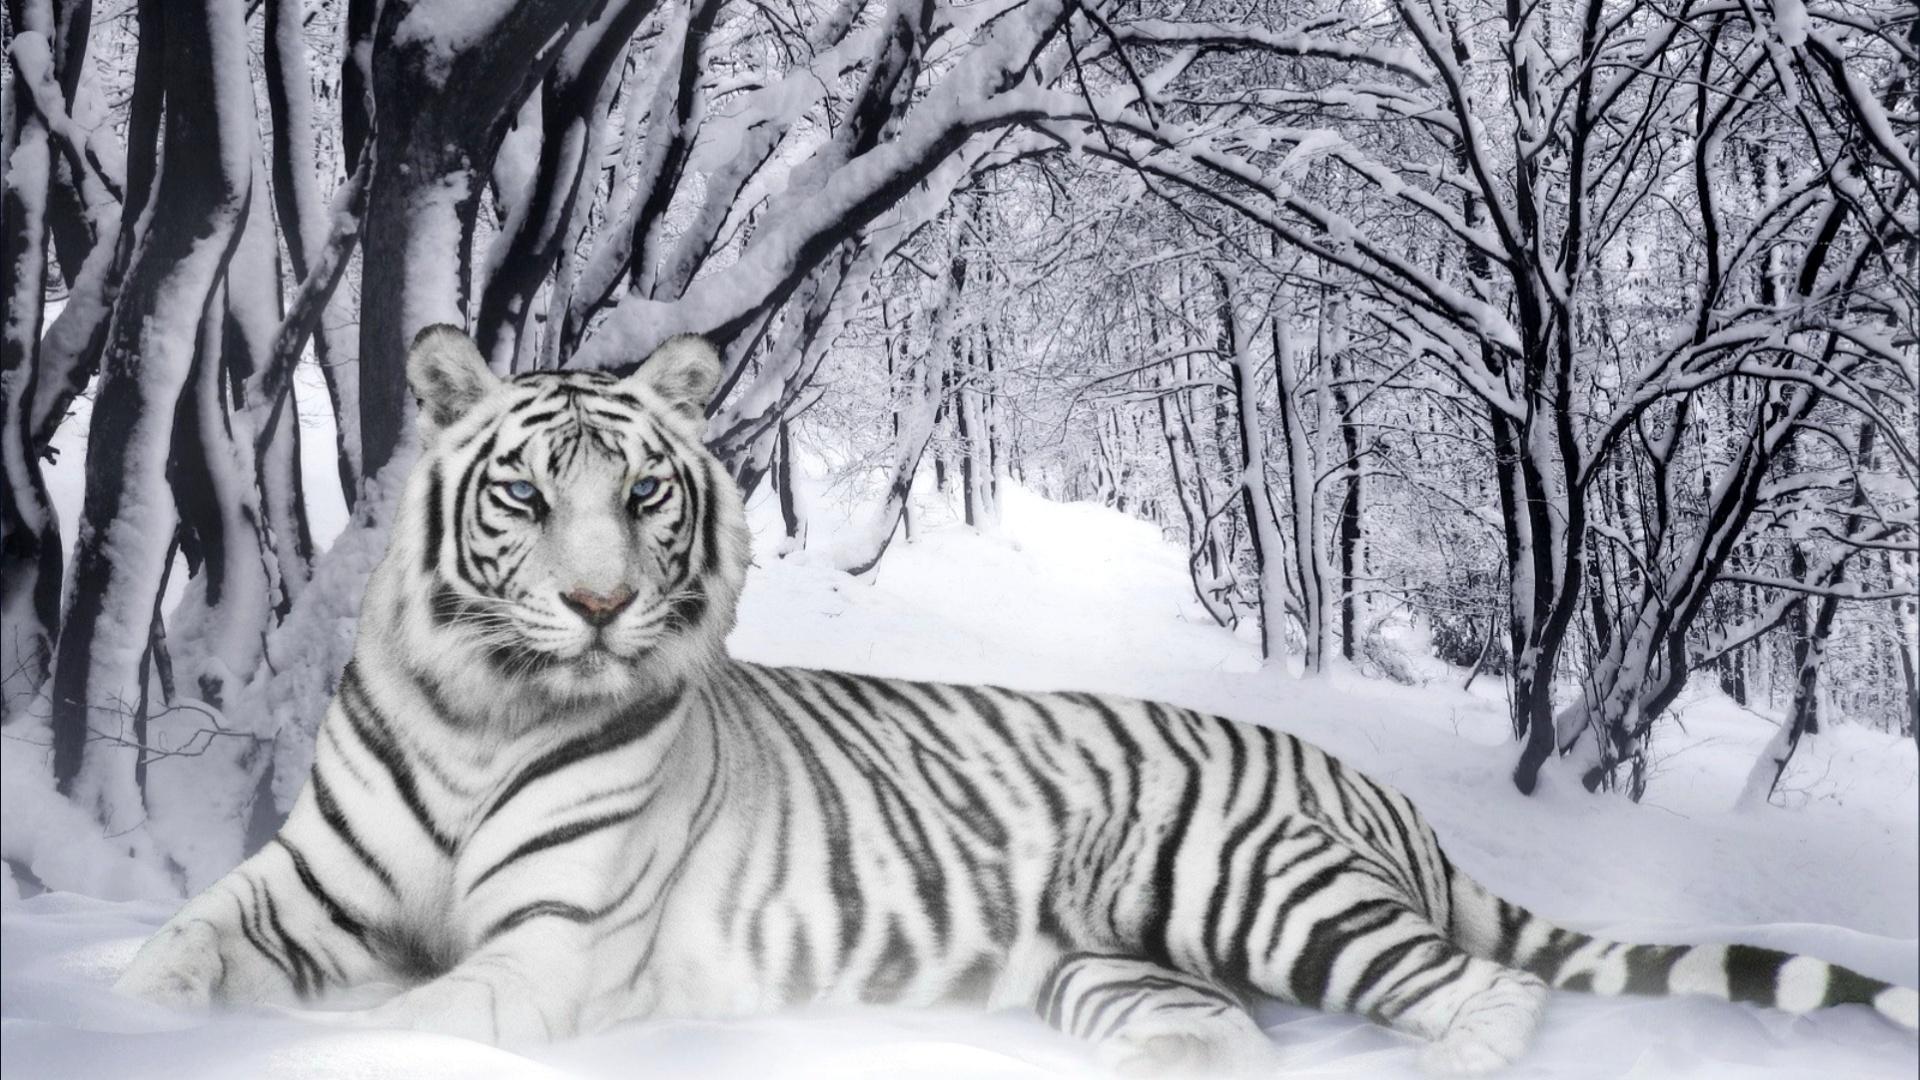 Witte tijger behang - White tiger wallpaper free download ...